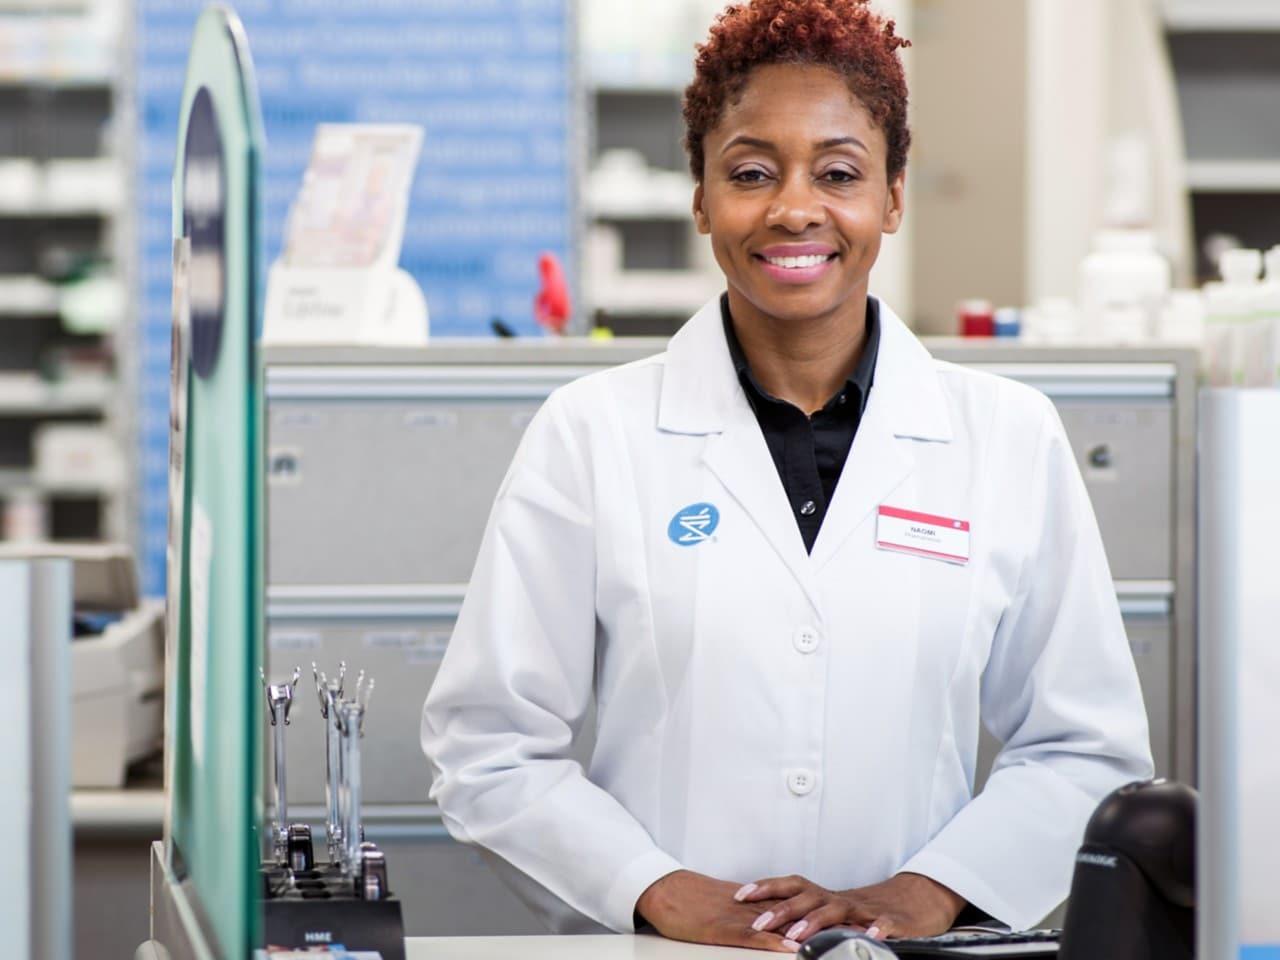 Smiling lady in white pharmacy coat